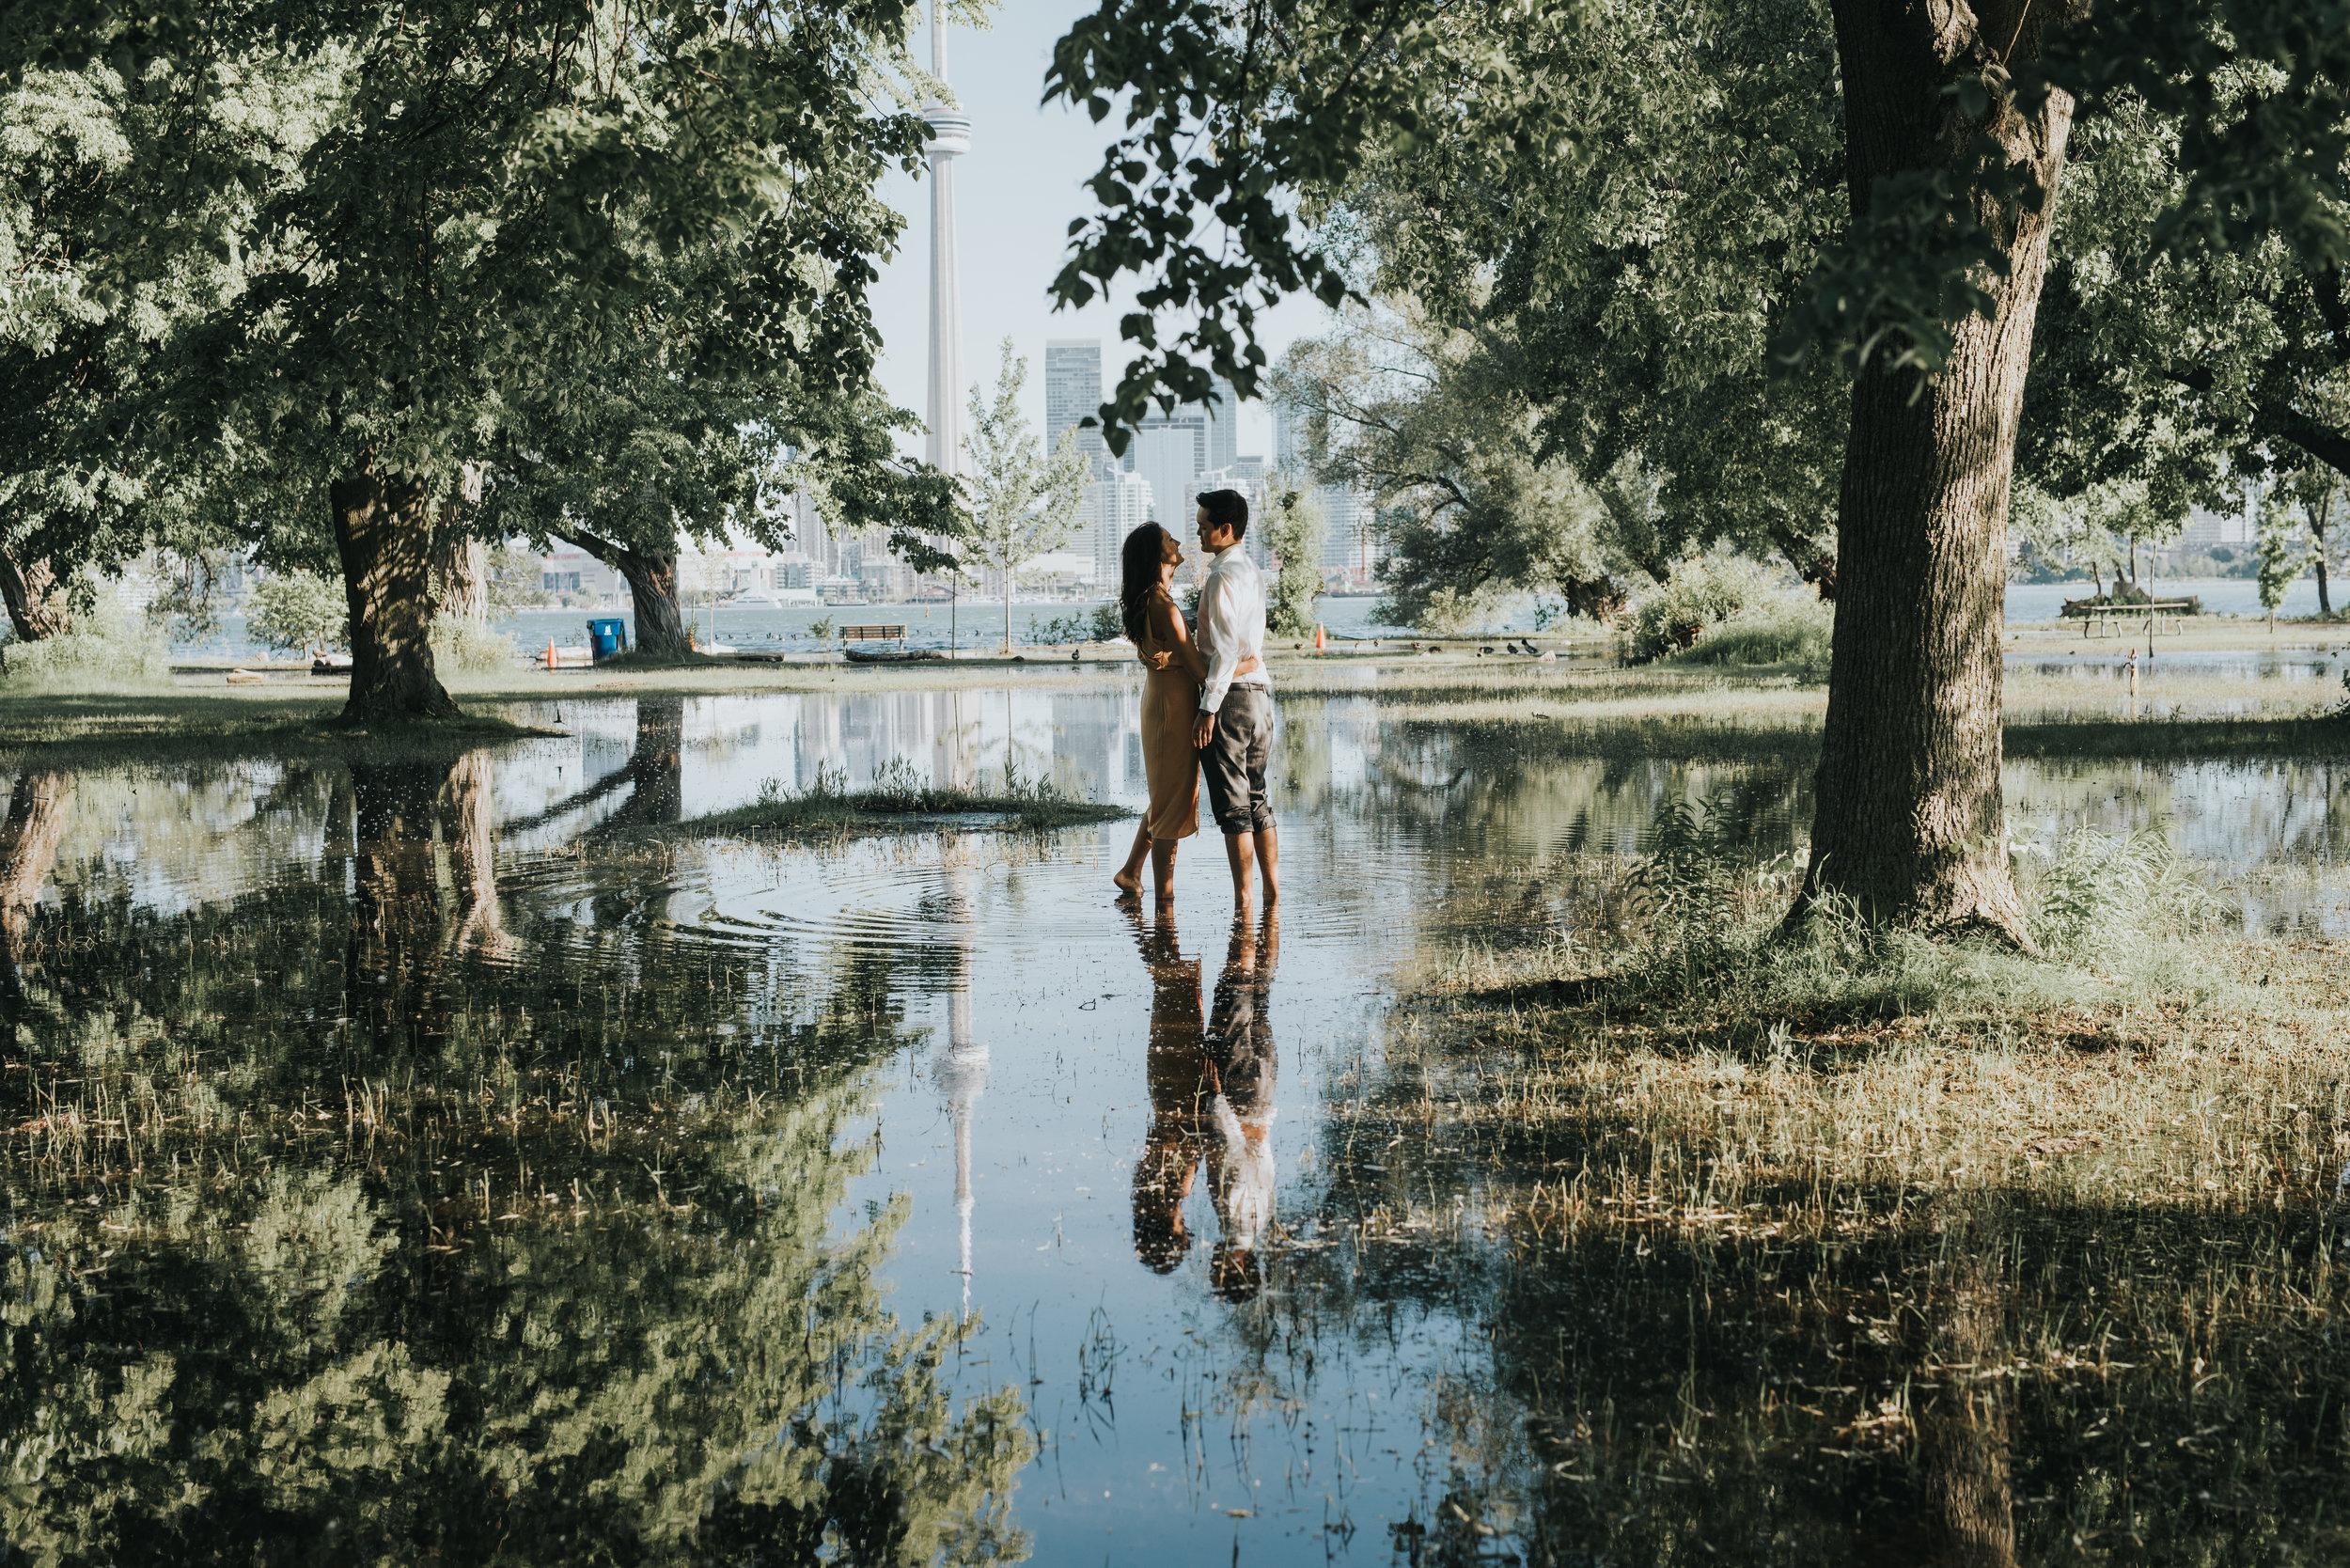 toronto-engagement-wedding-photography-by-willow-birch-photo-toronto